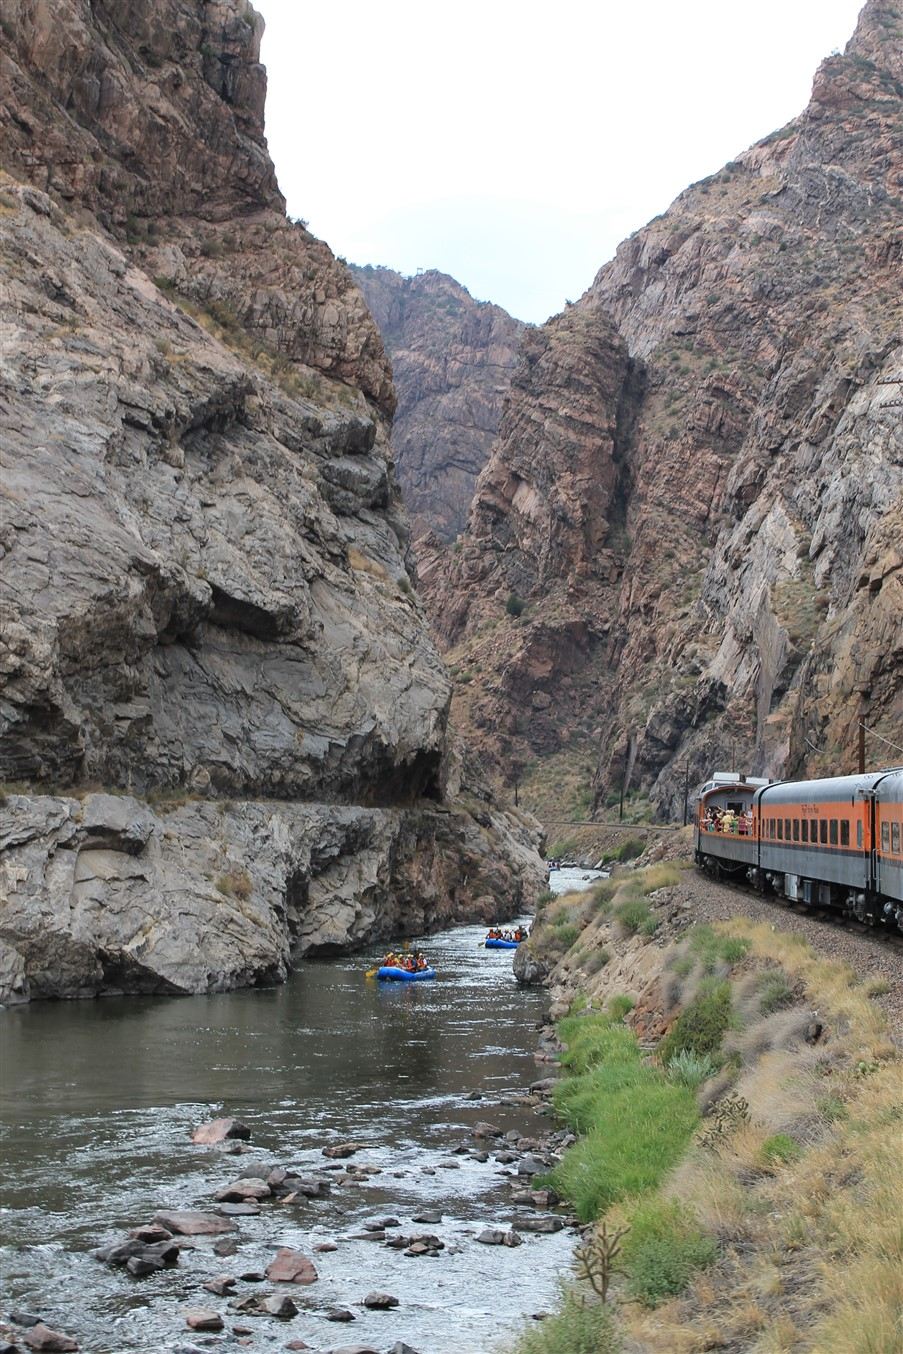 2012 07 06 179 Royal Gorge Railroad Colorado.jpg